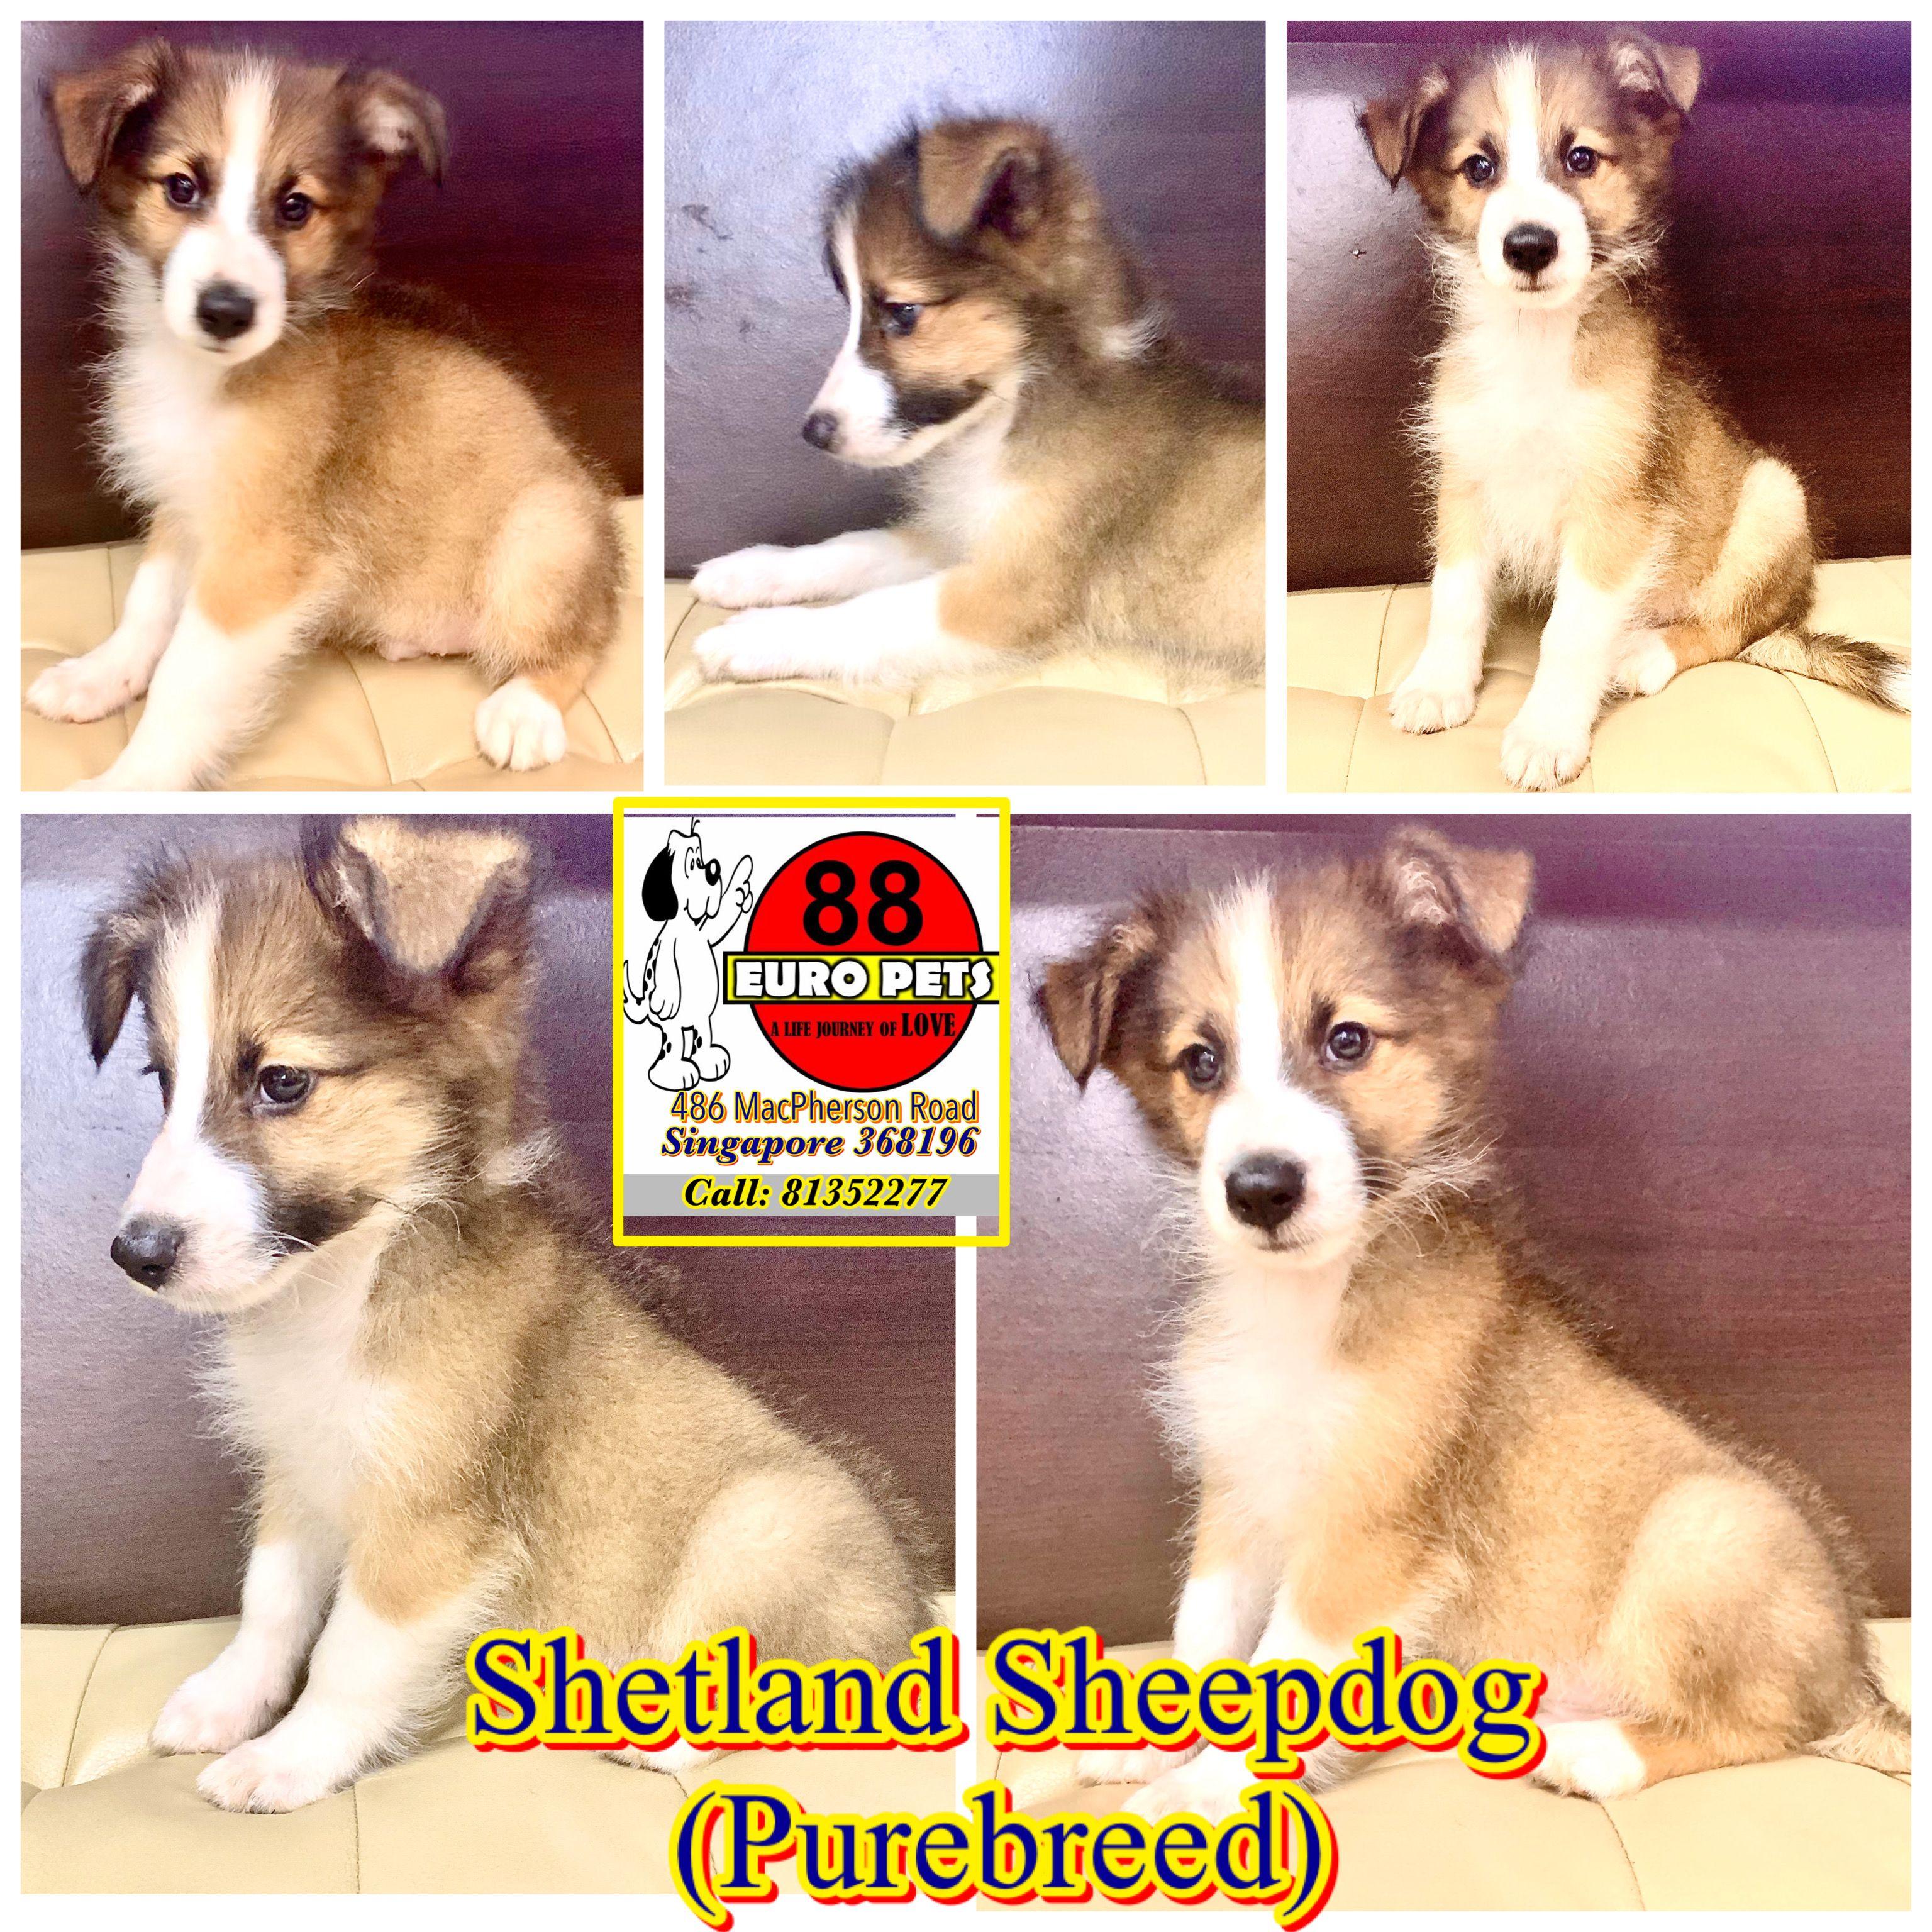 88europets 88europets88 Shetlandsheepdogforsale Sheltie Puppiesforsale Singapore Shetland Sheepdog Puppies Pomeranian Puppy For Sale Shetland Sheepdog